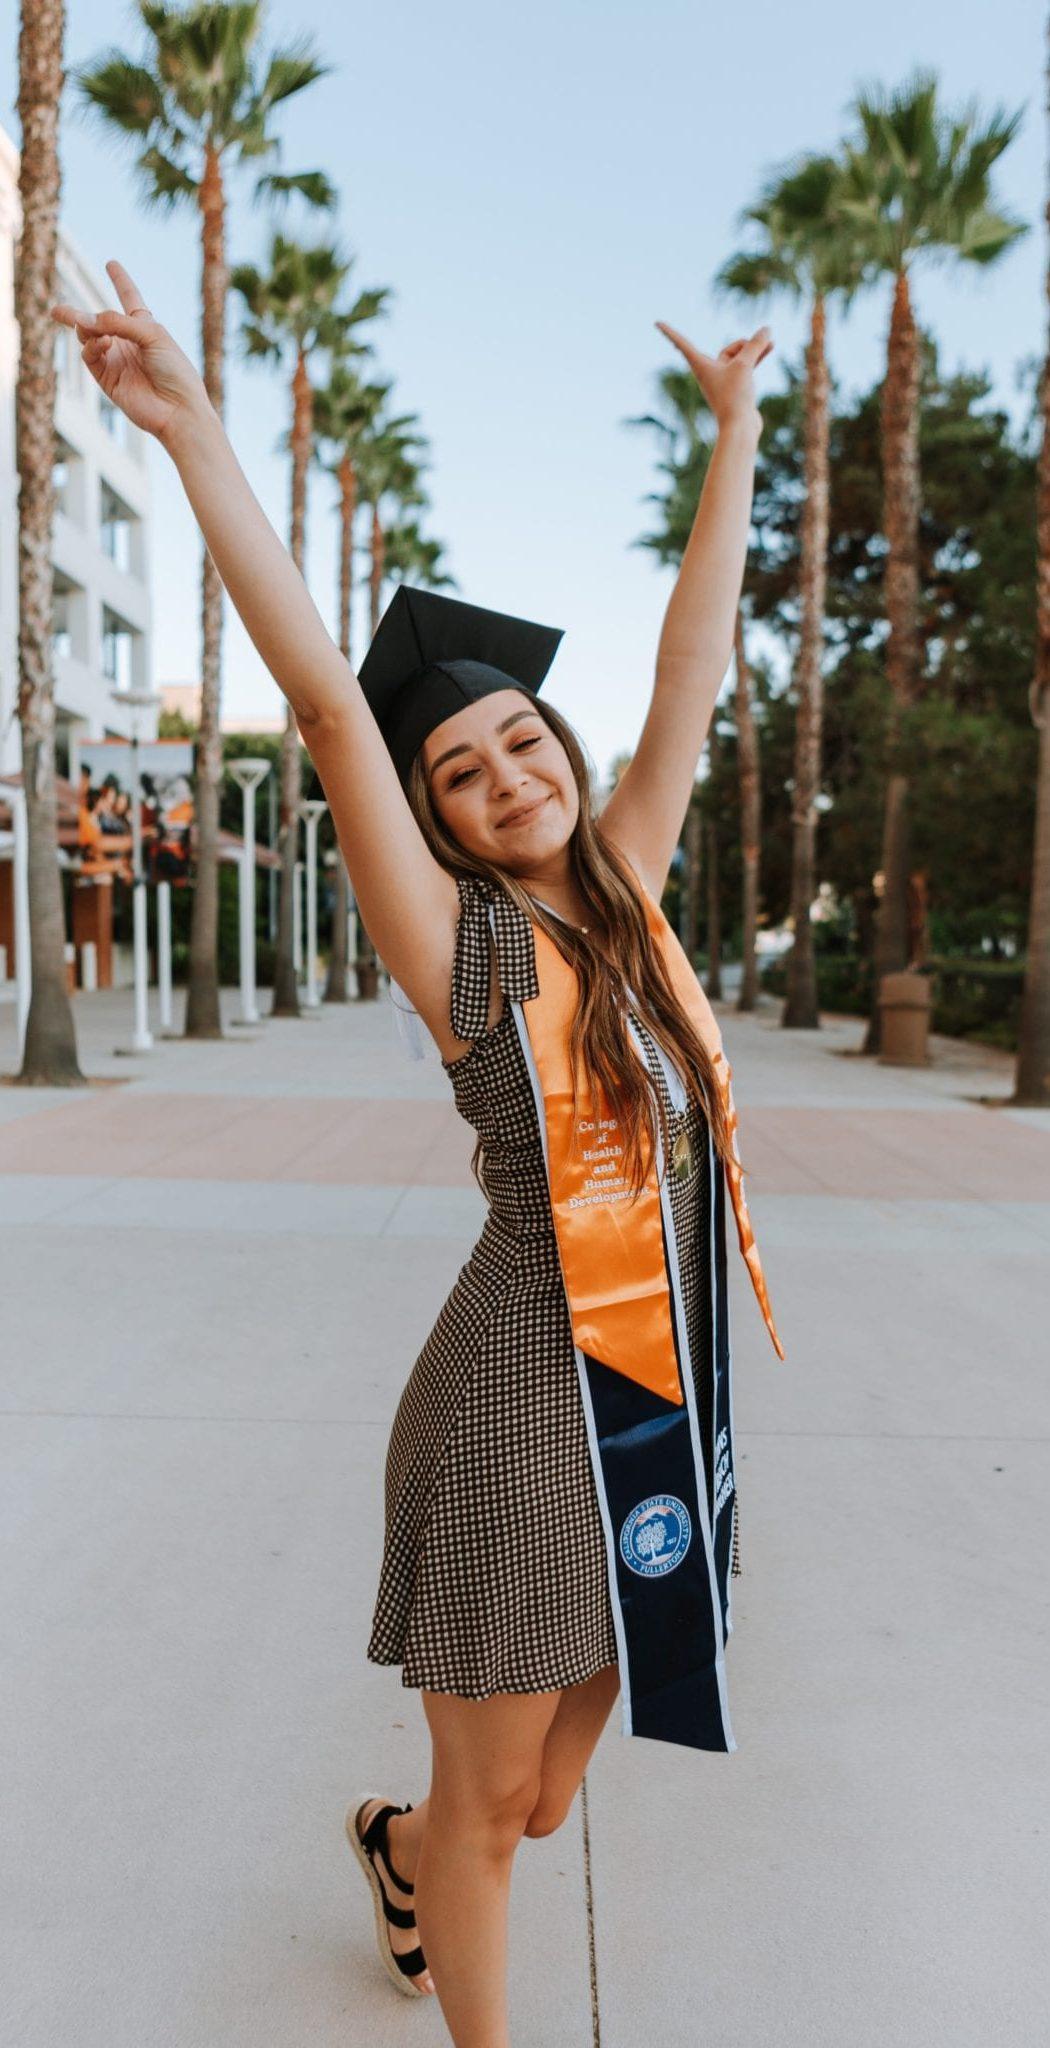 student - studenti - elab education - ielts - studiare all'estero - study abroad -students elab